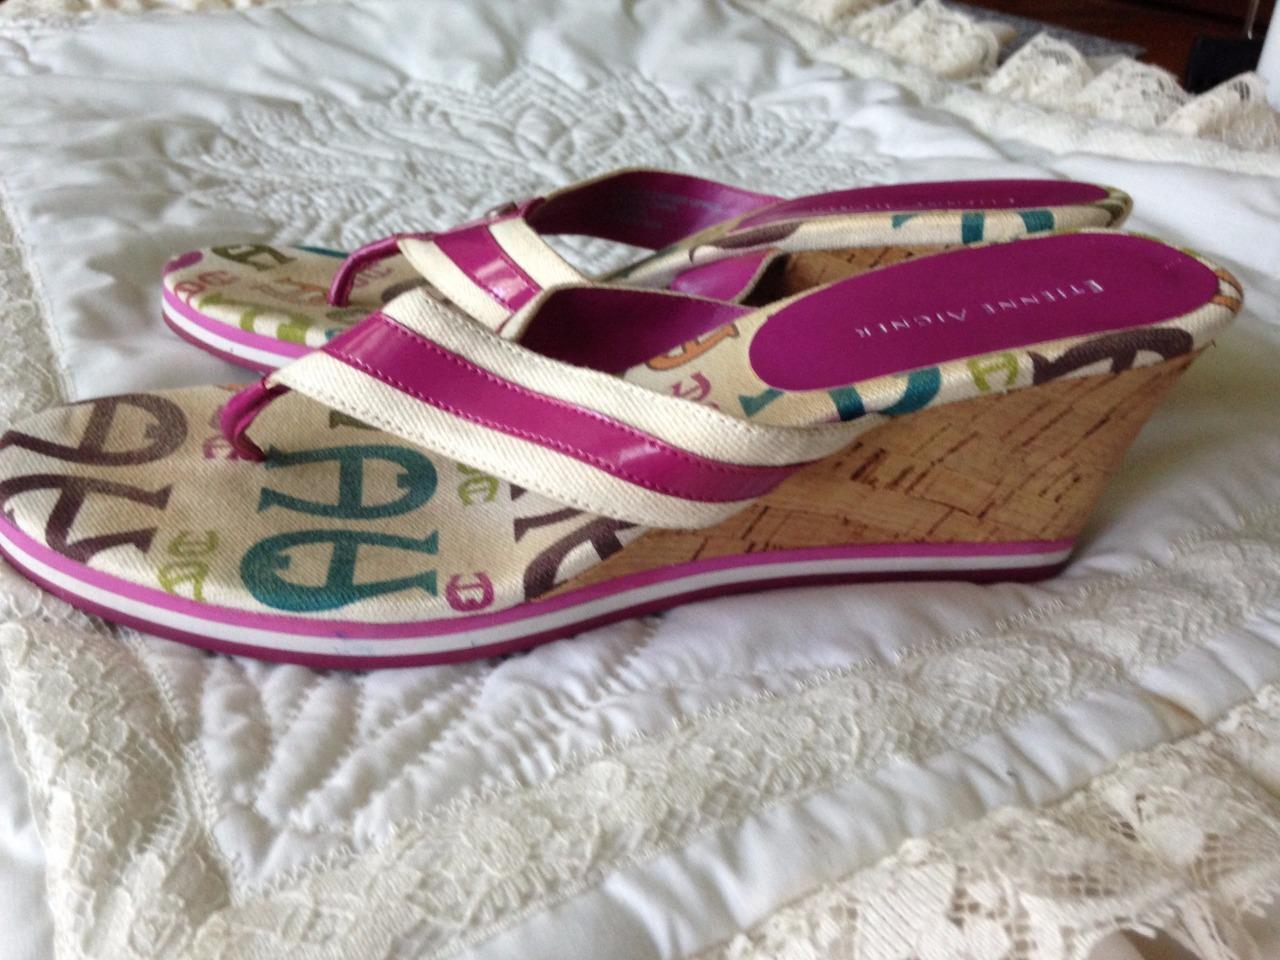 Etienne Aigner Rose Cork 2 3/4 Inch Wedge Cork Rose Heel Sandal/Thong Size 8 1/2 Medium 037440